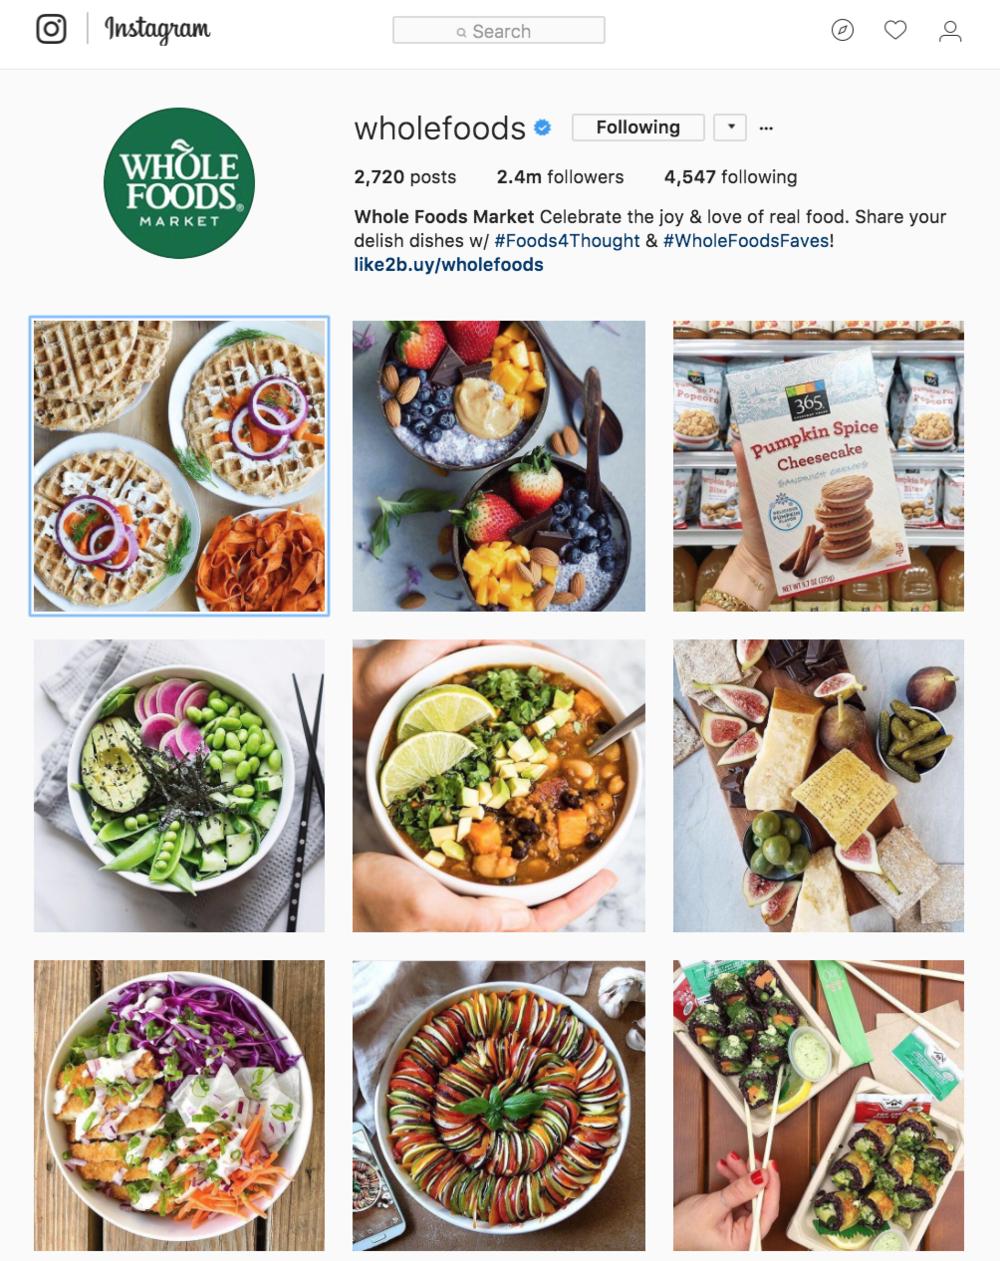 Whole Foods Market Instagram,instagram.com/wholefoods.